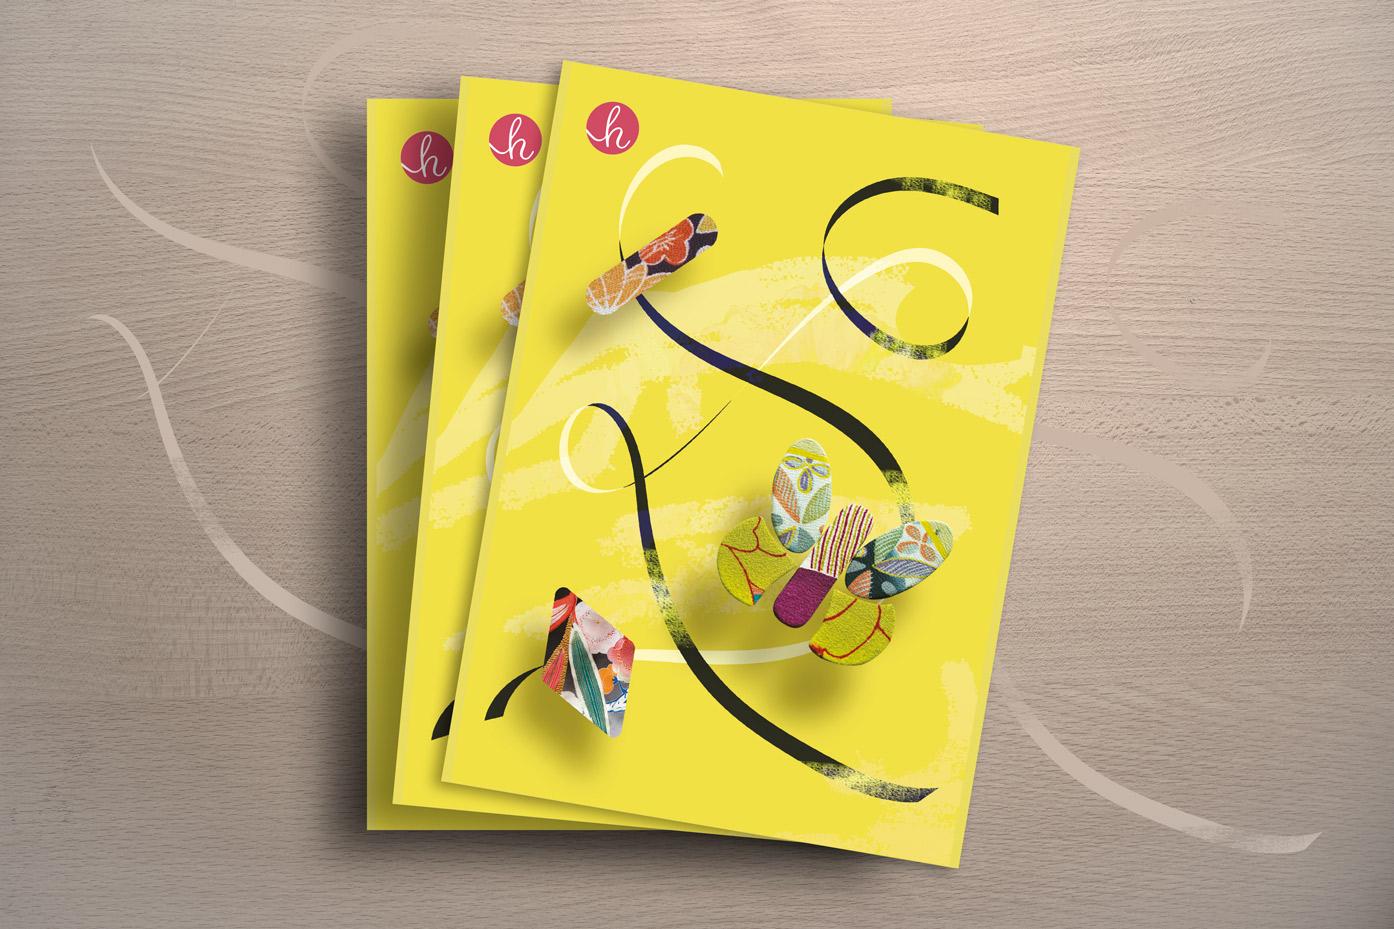 Identite-Galerie-h-Carton-Graphiste-Sophie-Jaton